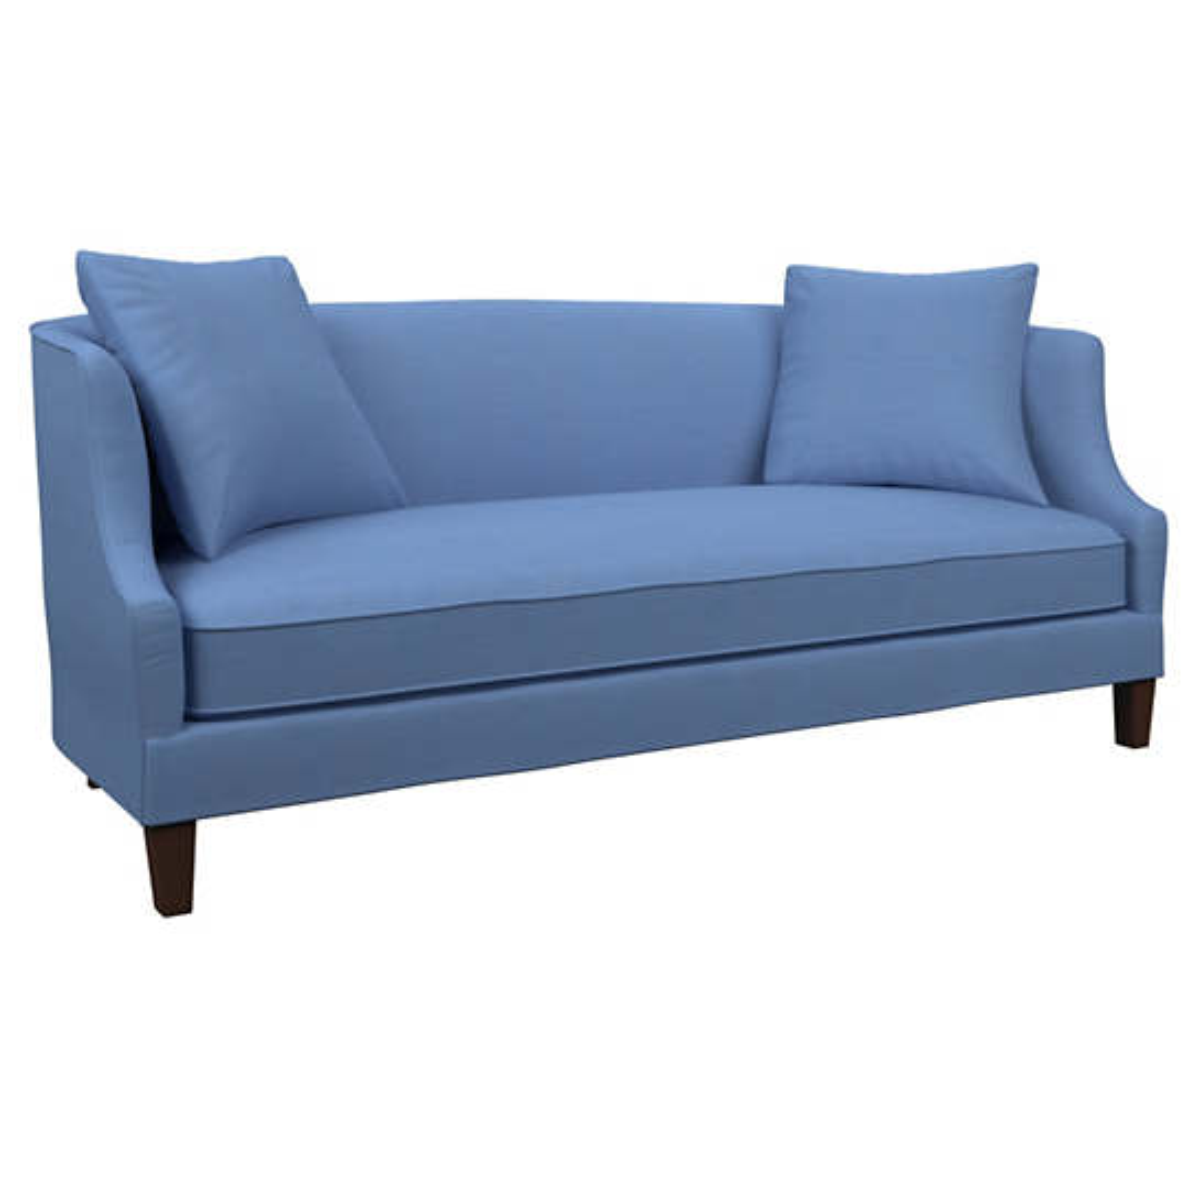 Estate Linen French Blue Cheshire Sofa